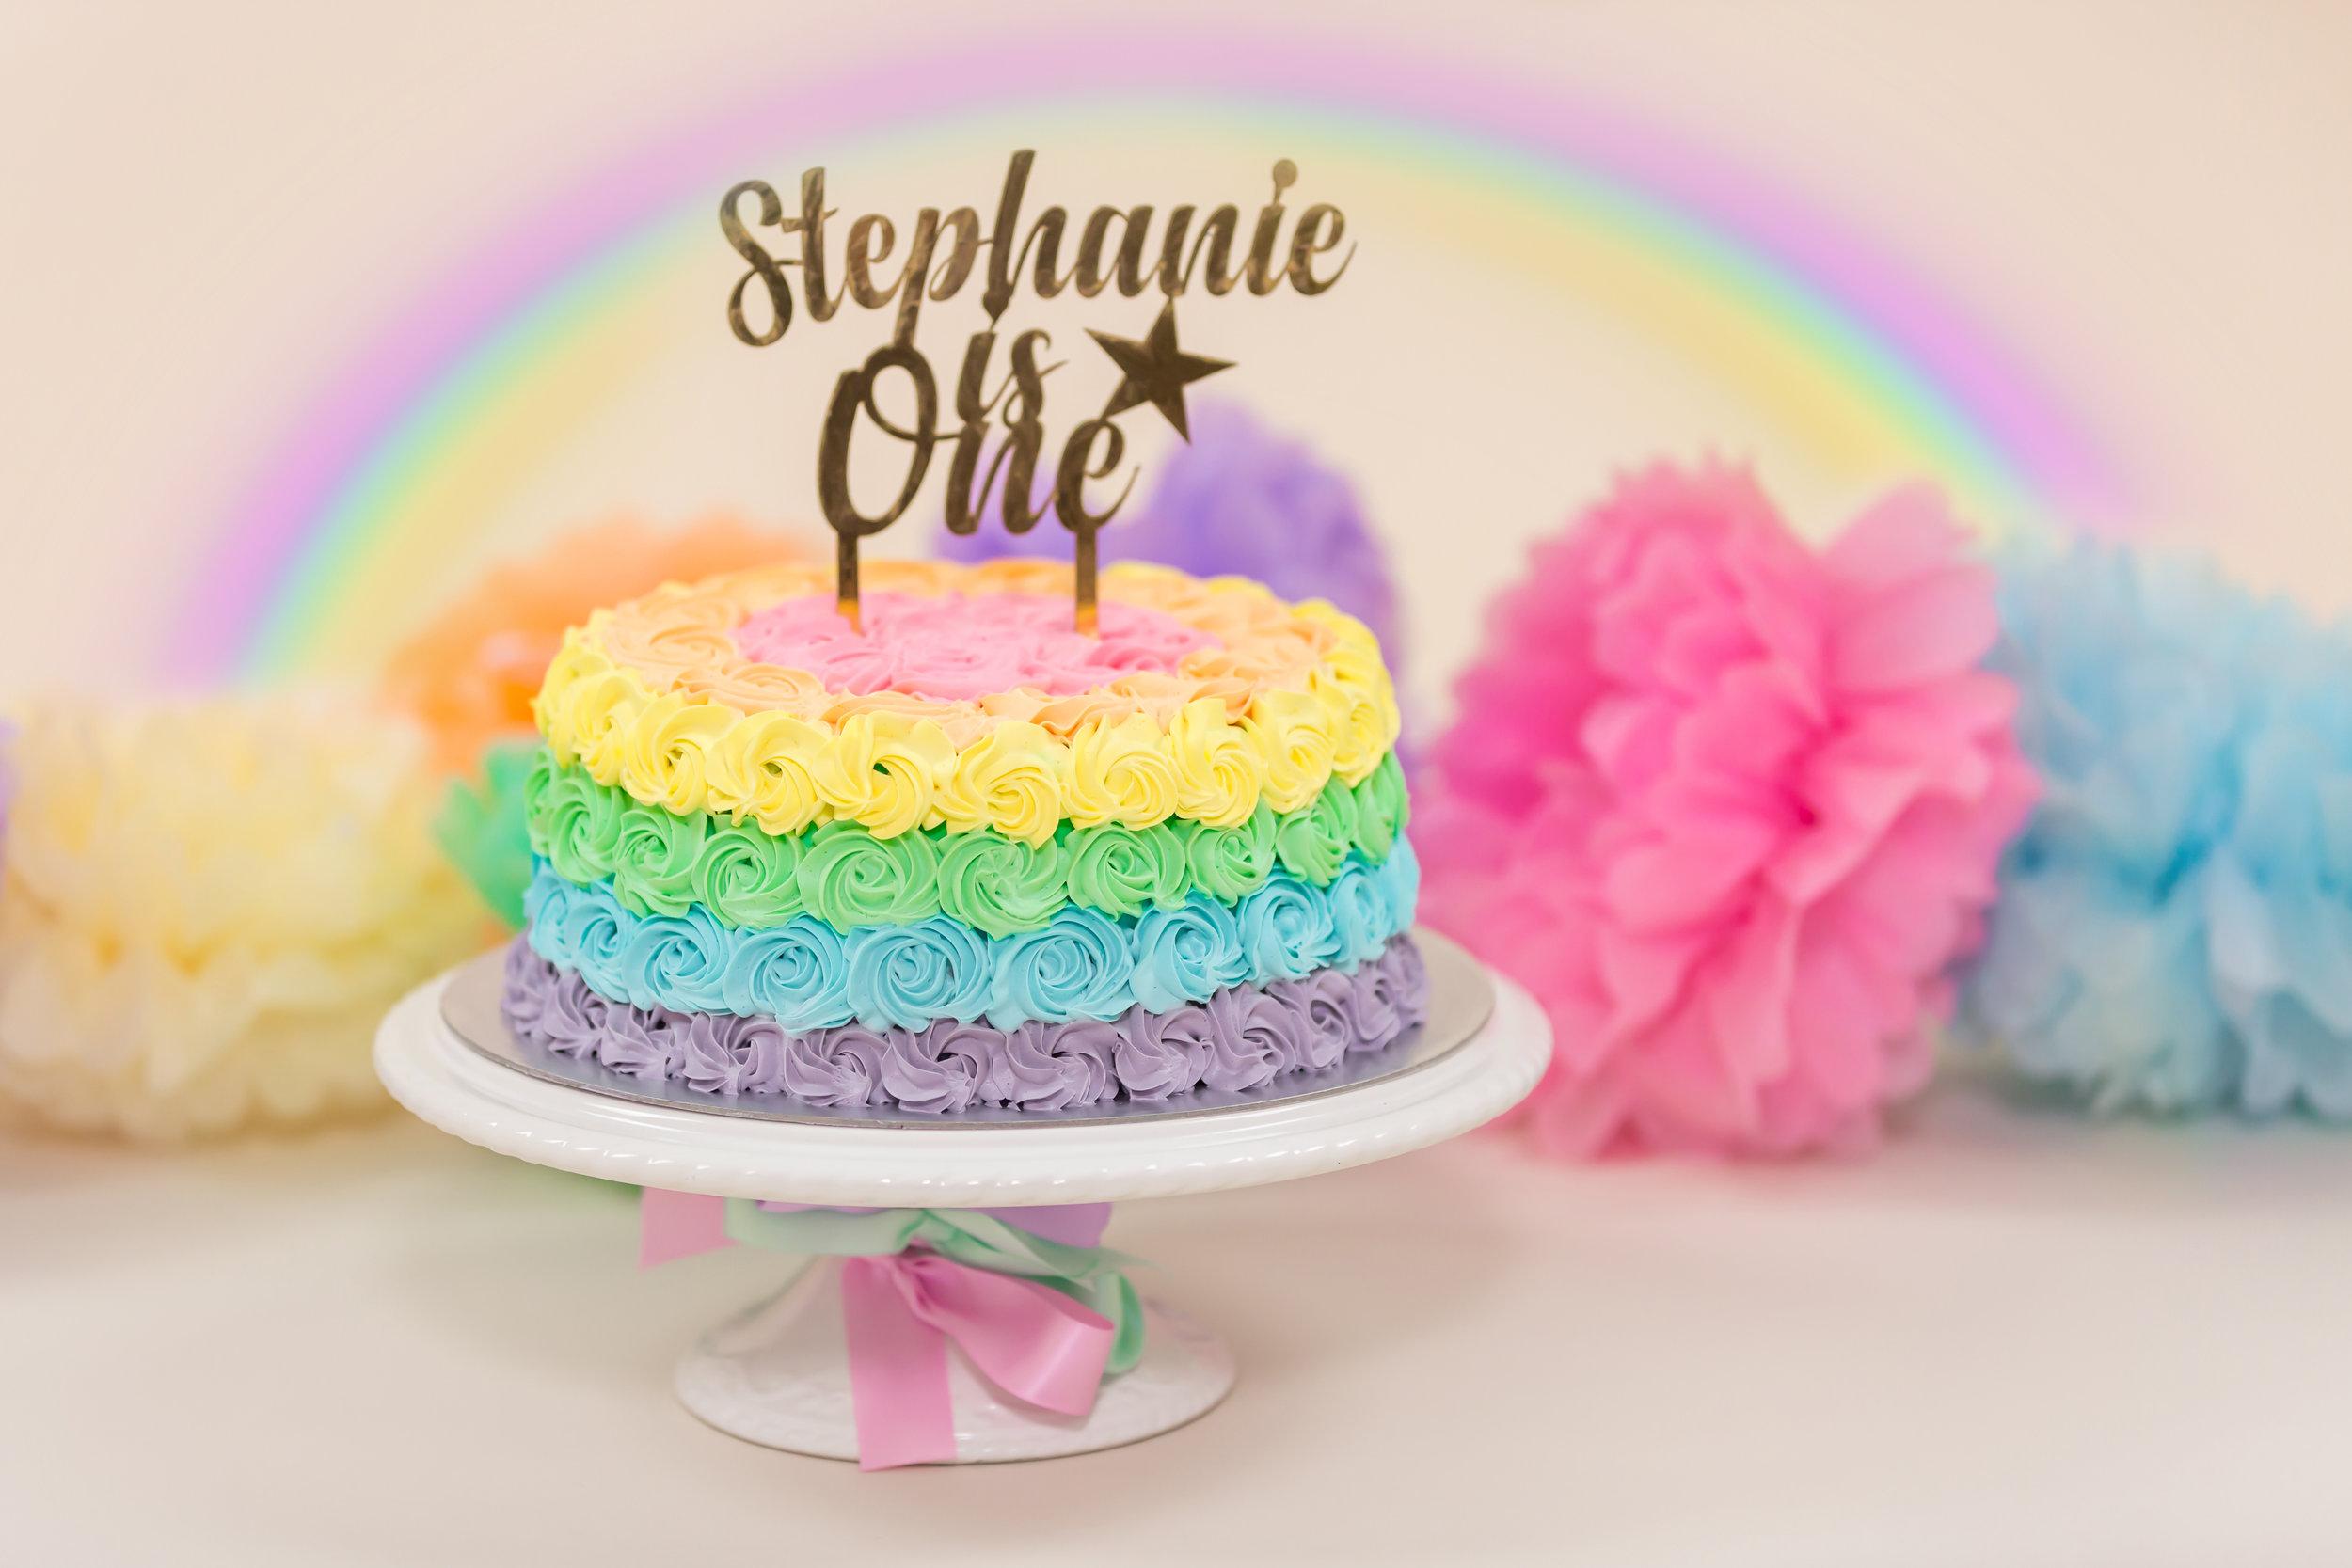 Stephanie (1).jpg